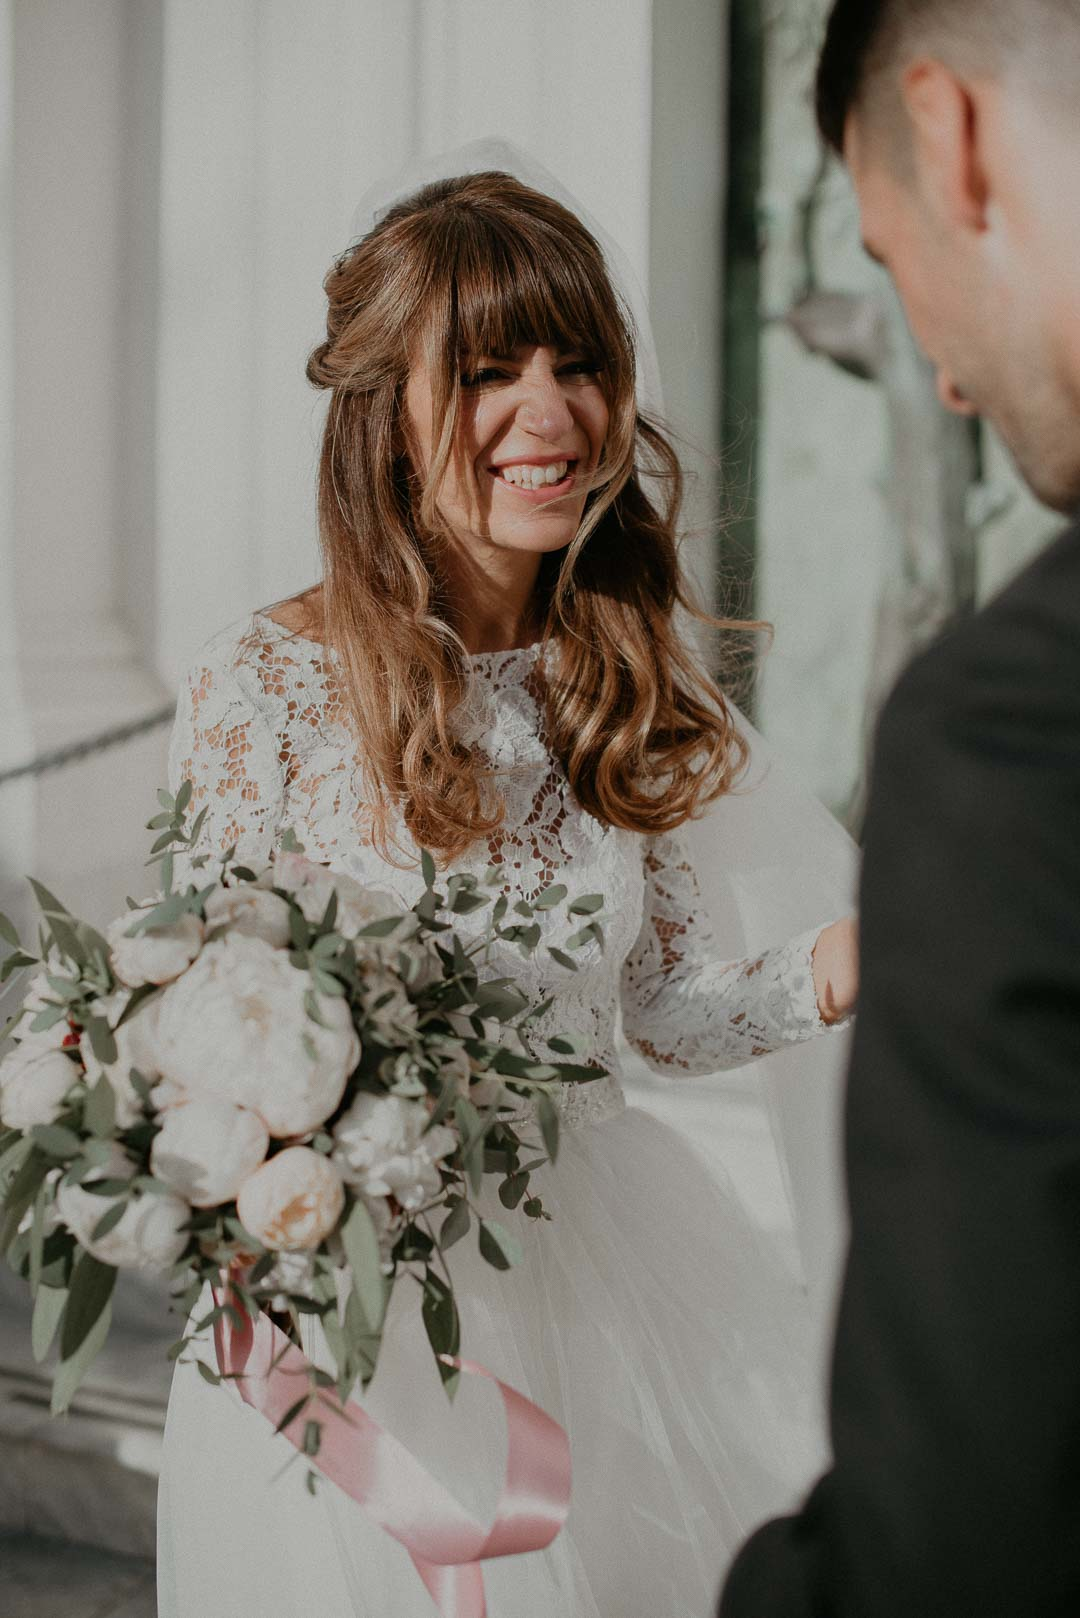 wedding-photographer-destination-fineart-bespoke-reportage-napoli-nabilah-vivianeizzo-spazio46-77